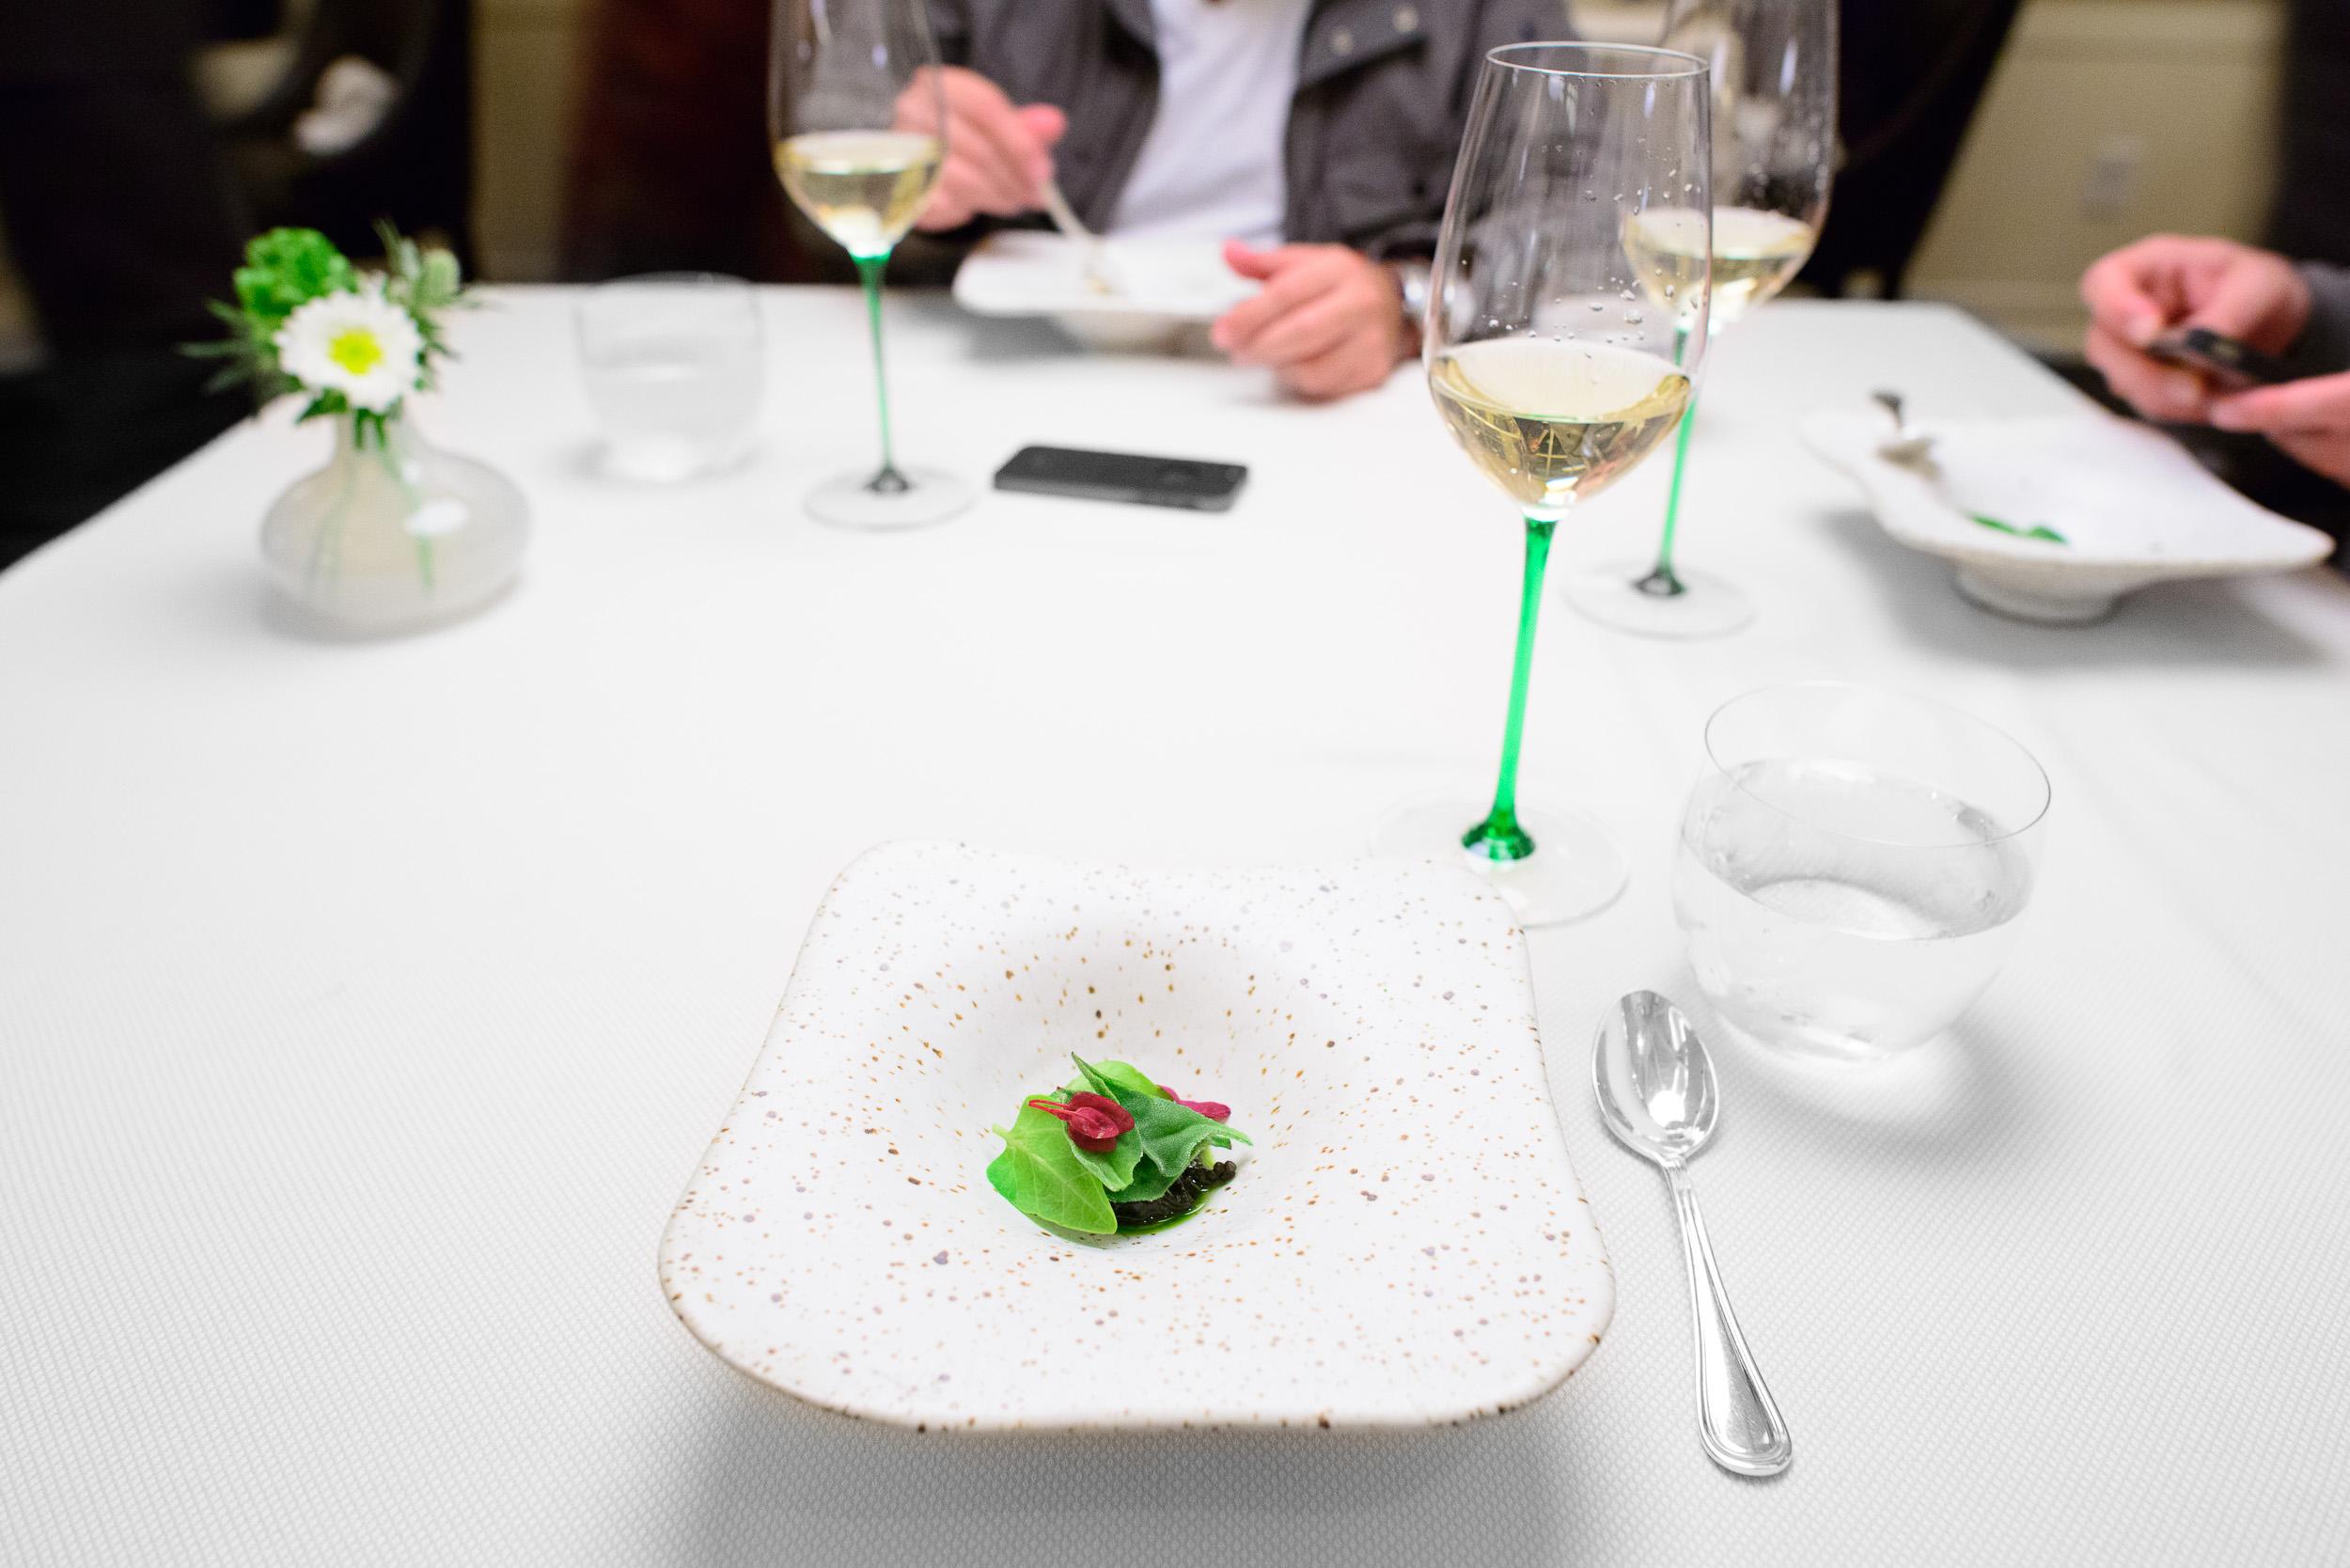 4th Course: Succulents, warm caviar